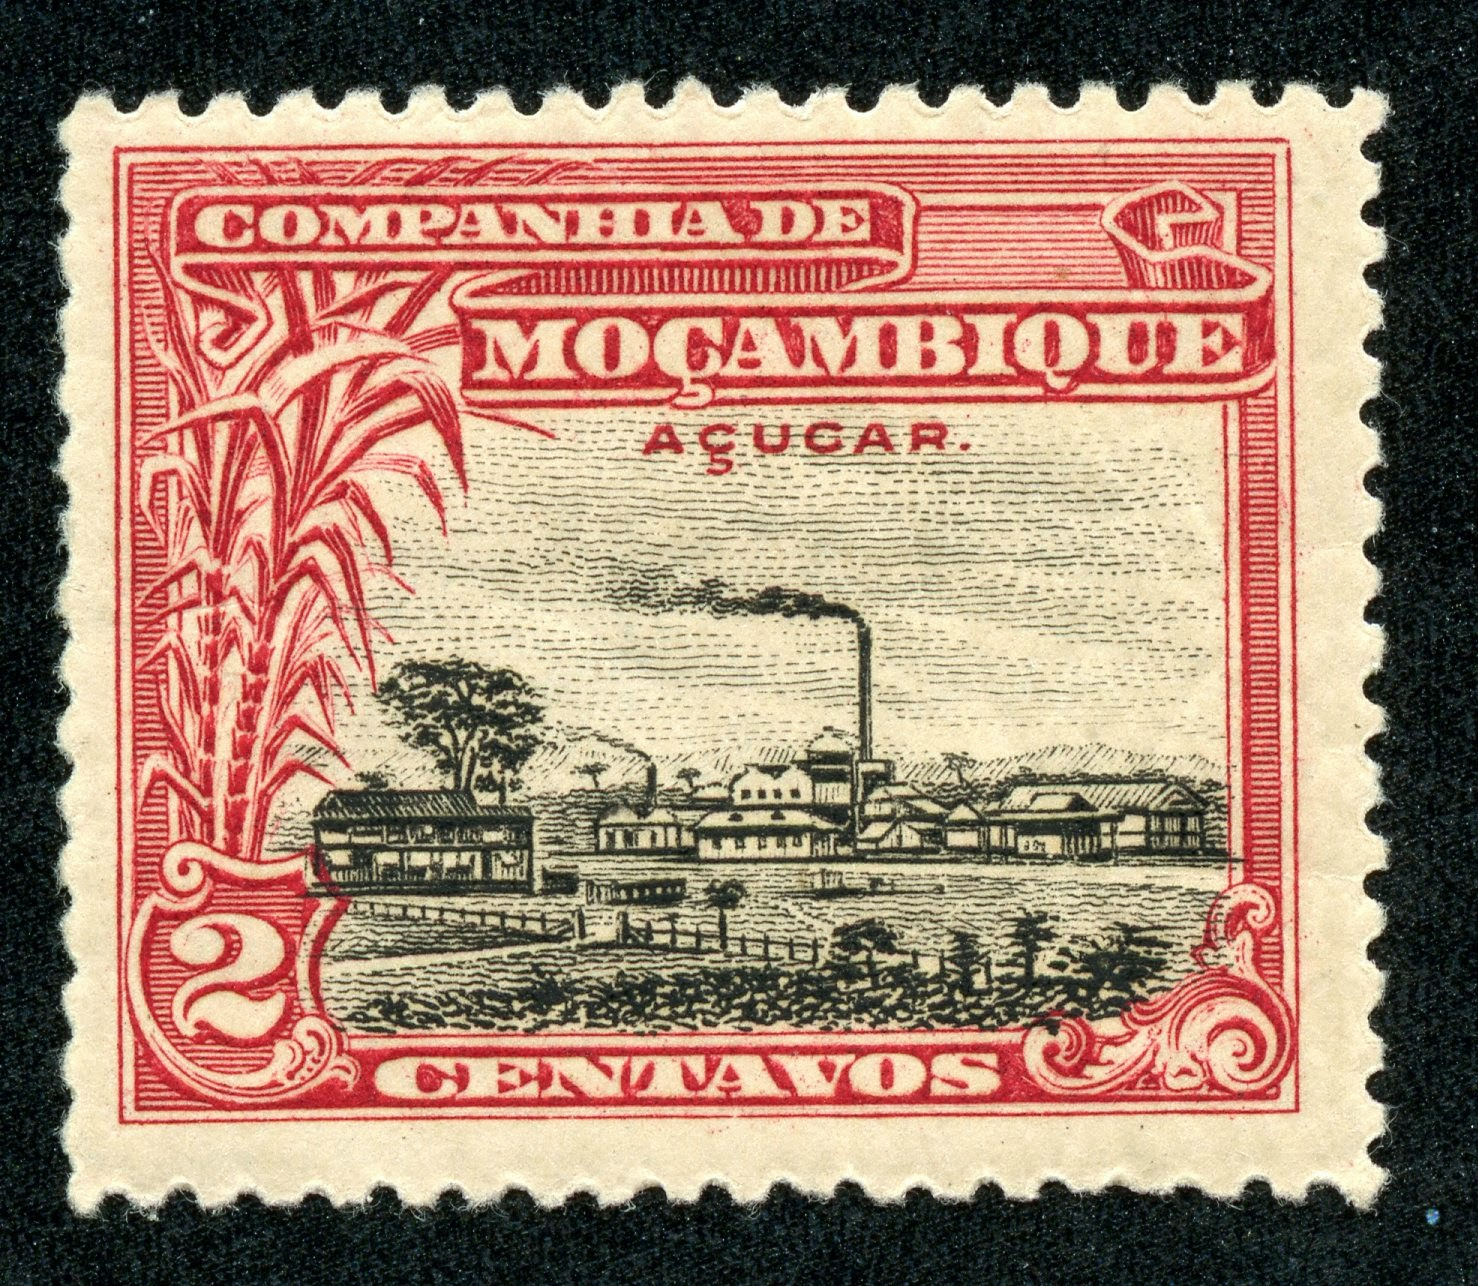 Big Blue 1840 1940 The Pictorials Of Mozambique Company